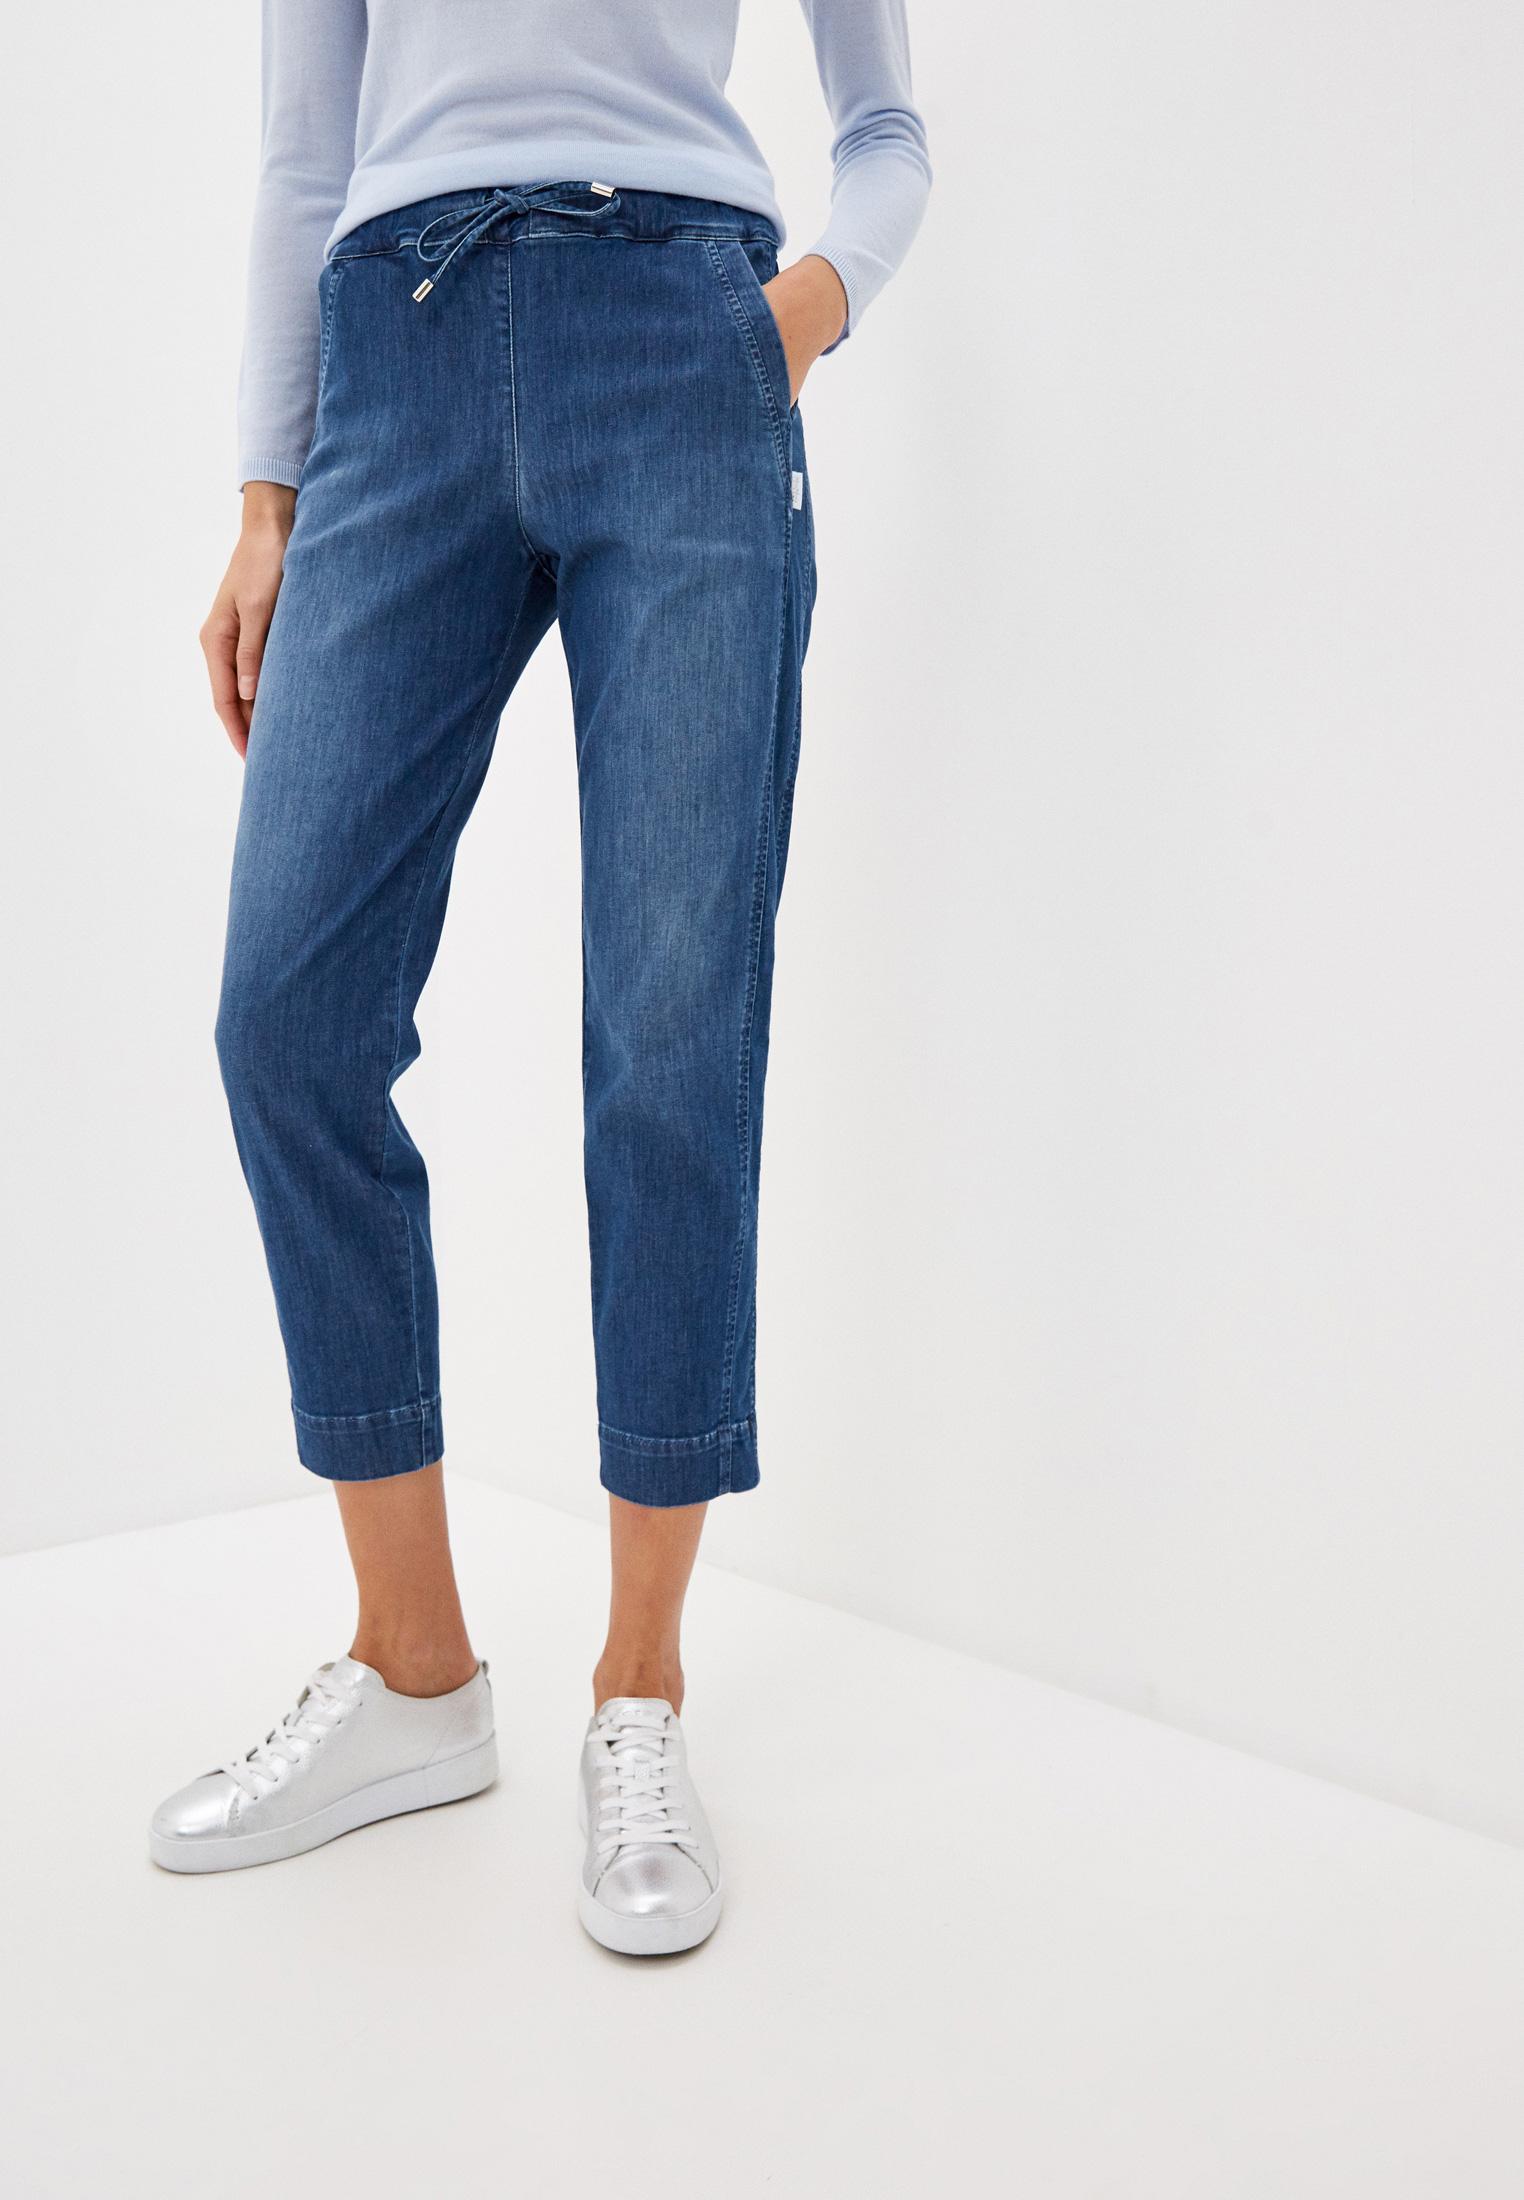 Прямые джинсы Max Mara Leisure 3131070606